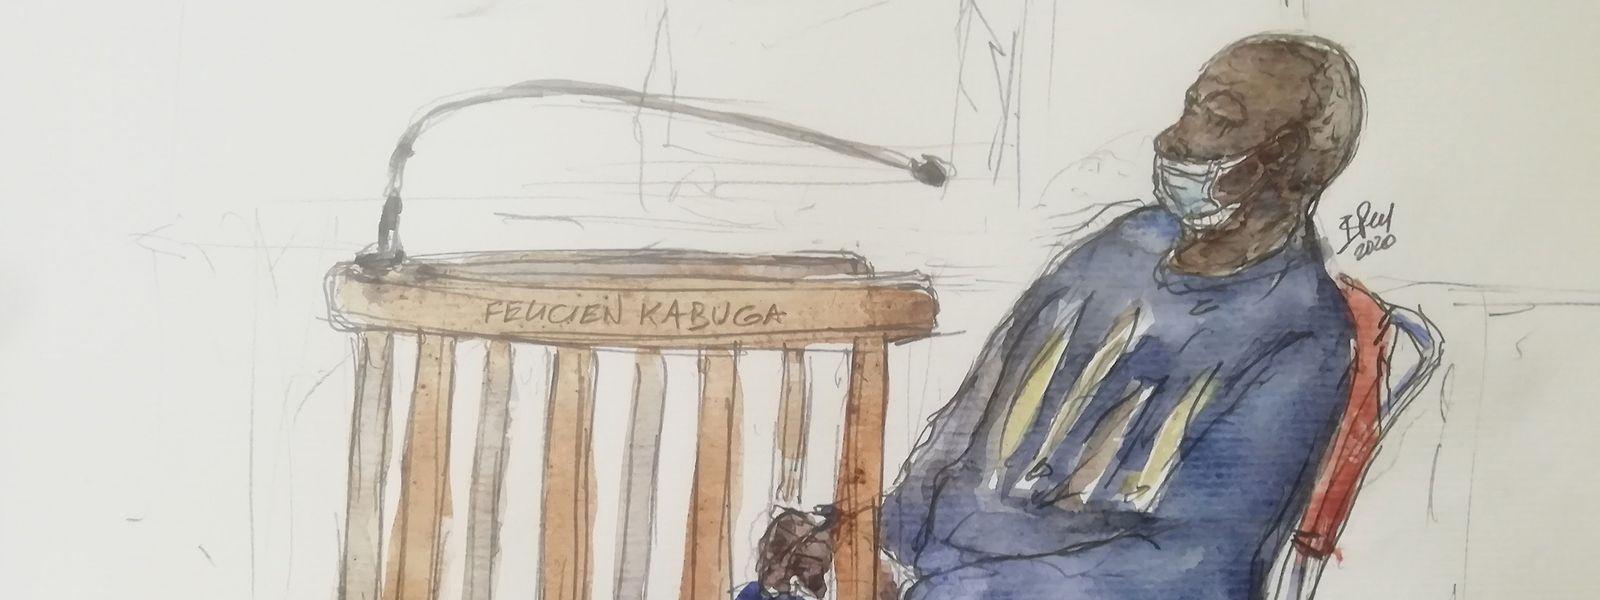 Félicien Kabuga vor Gericht